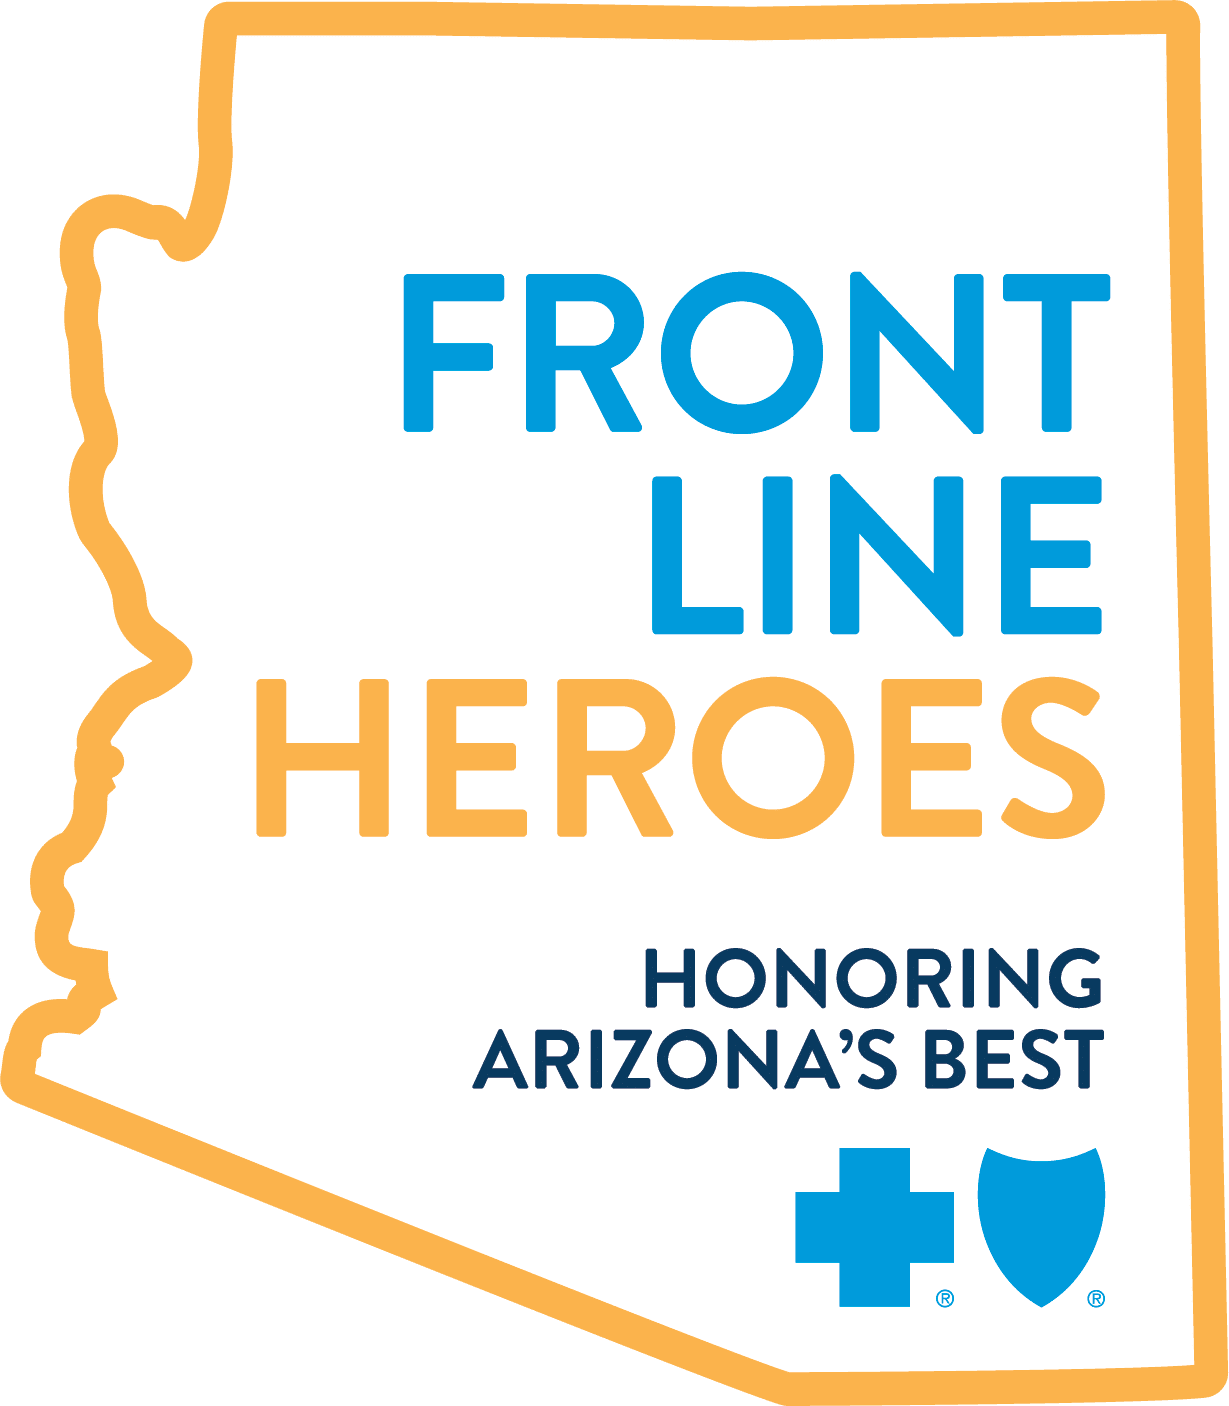 frontline heroes logo